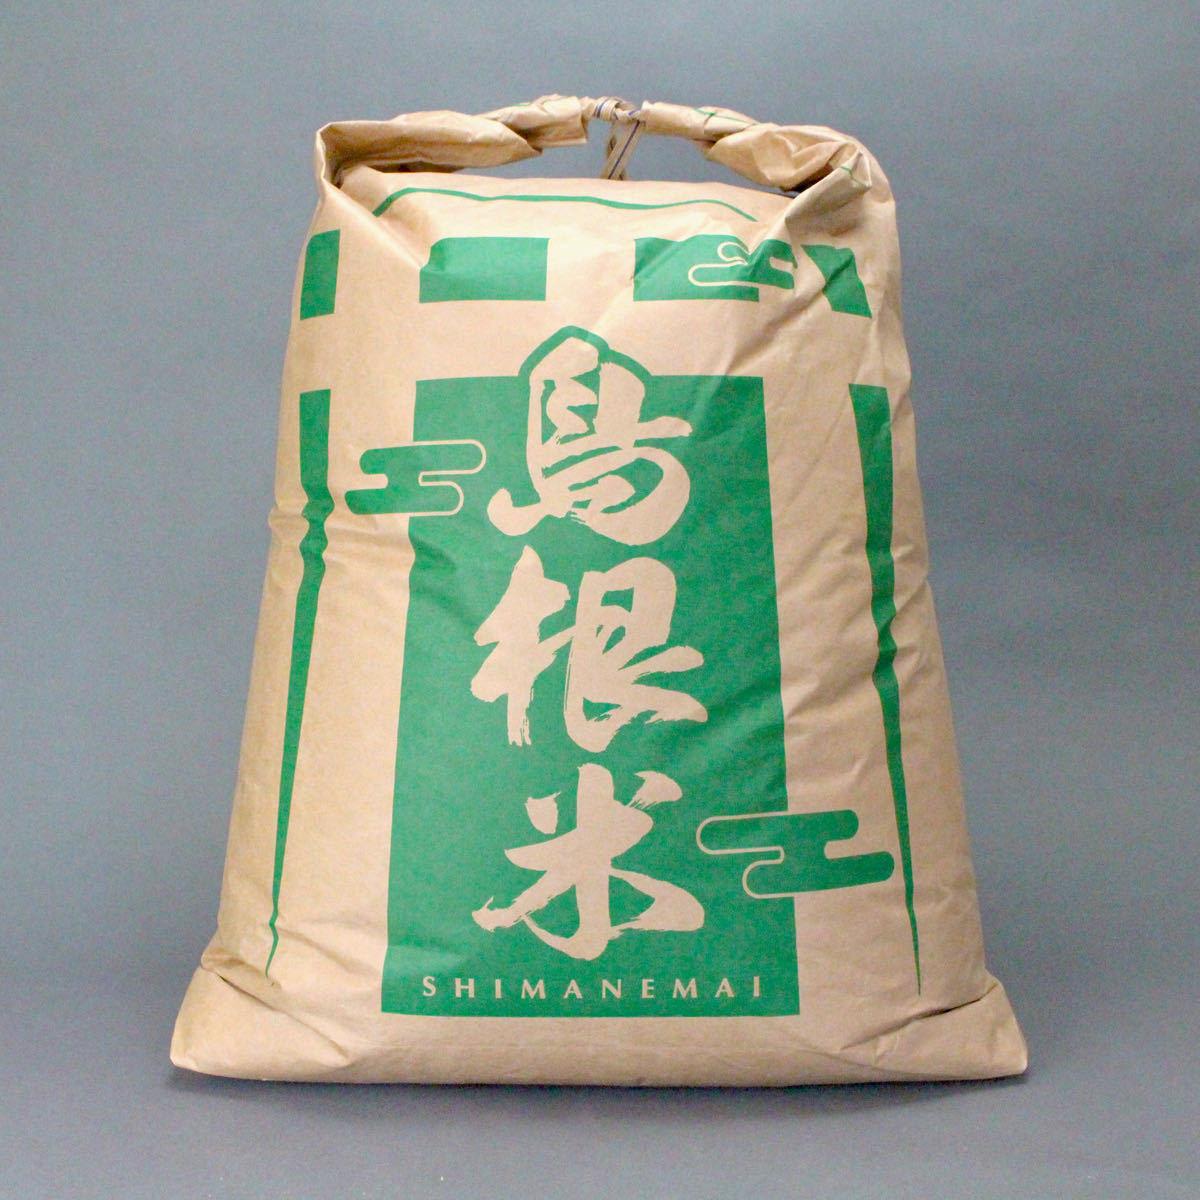 G065【送料無料】玄米 中米 令和2年産 1.89~1.80mm 約24~25kg 色選済 ハナエチゼン・コシヒカリ・つや姫・きぬむすめ 島根県産 2020年産_画像2